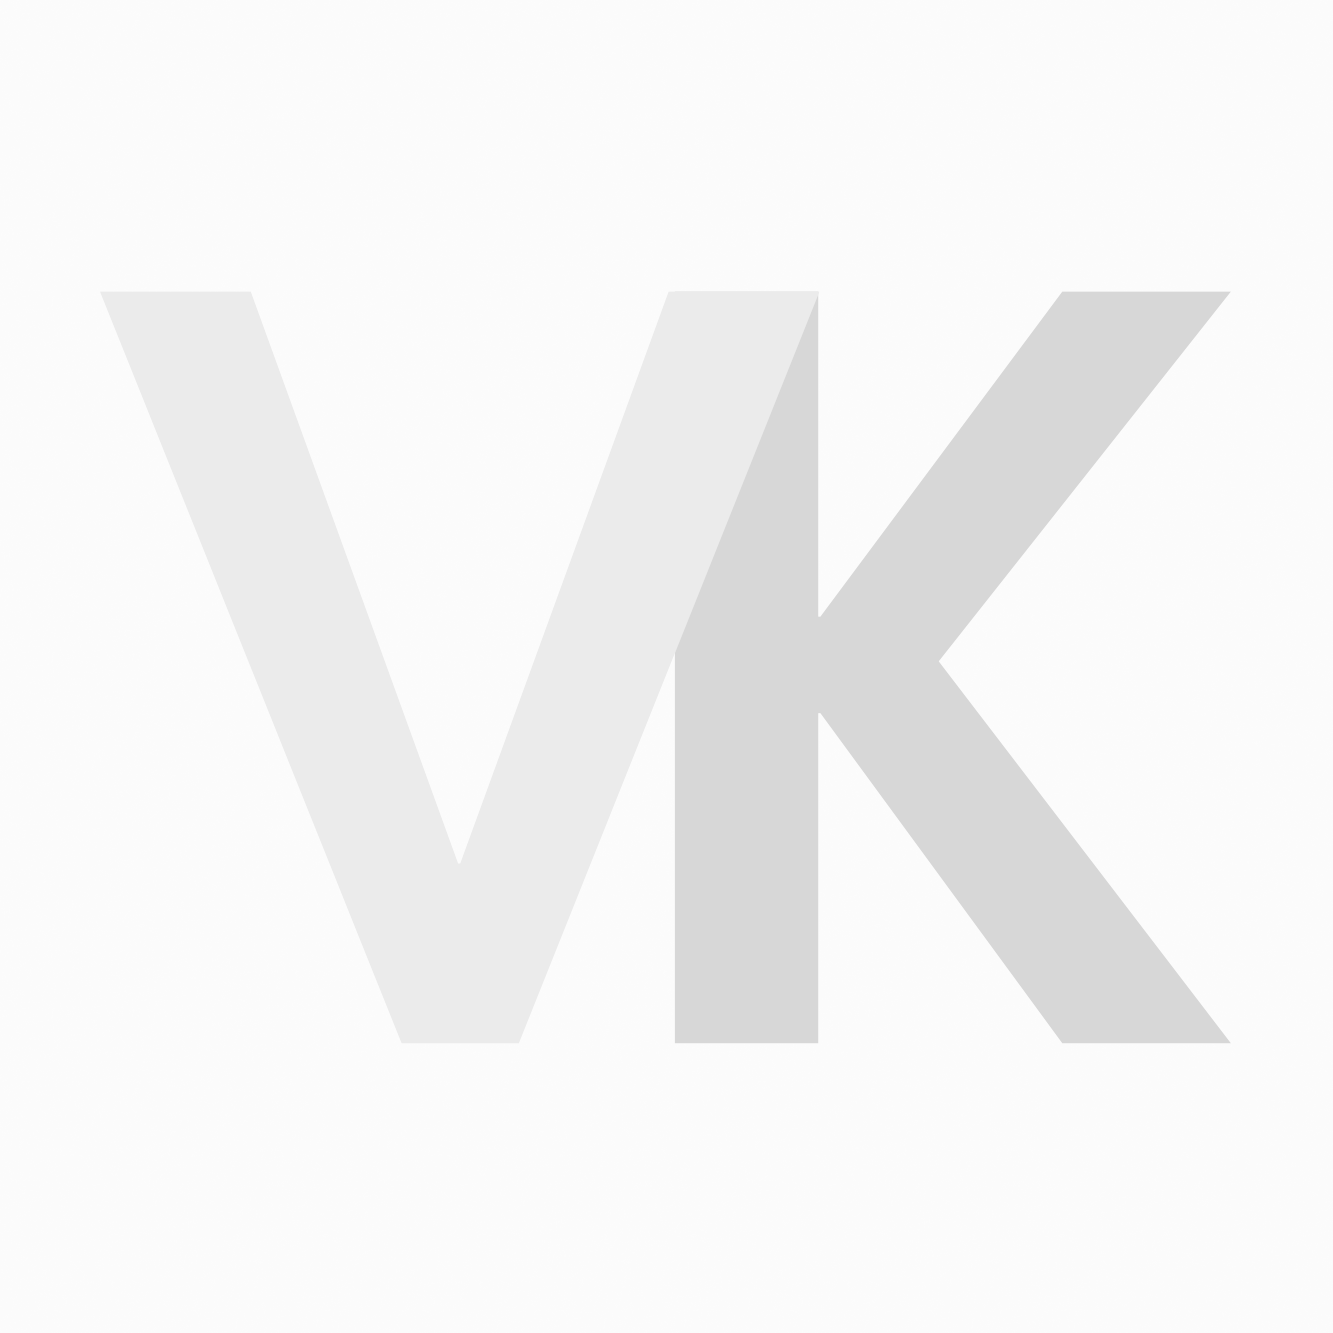 Wahl Opzetkam Wit Kunststof  #1.5 4.5mm